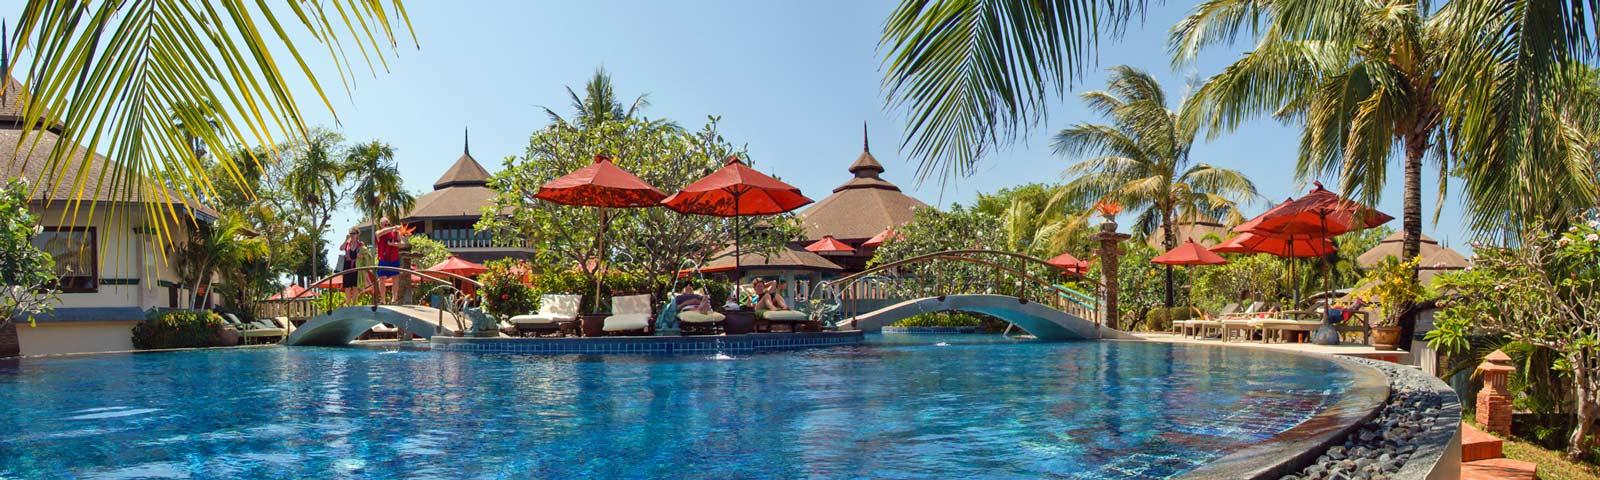 Ayurveda, Wellness and Yoga Retreats, Vegetarian, vegan, organic healthy food and drinks at Mangosteen Ayurveda and Wellness Resort, Rawai, Phuket.